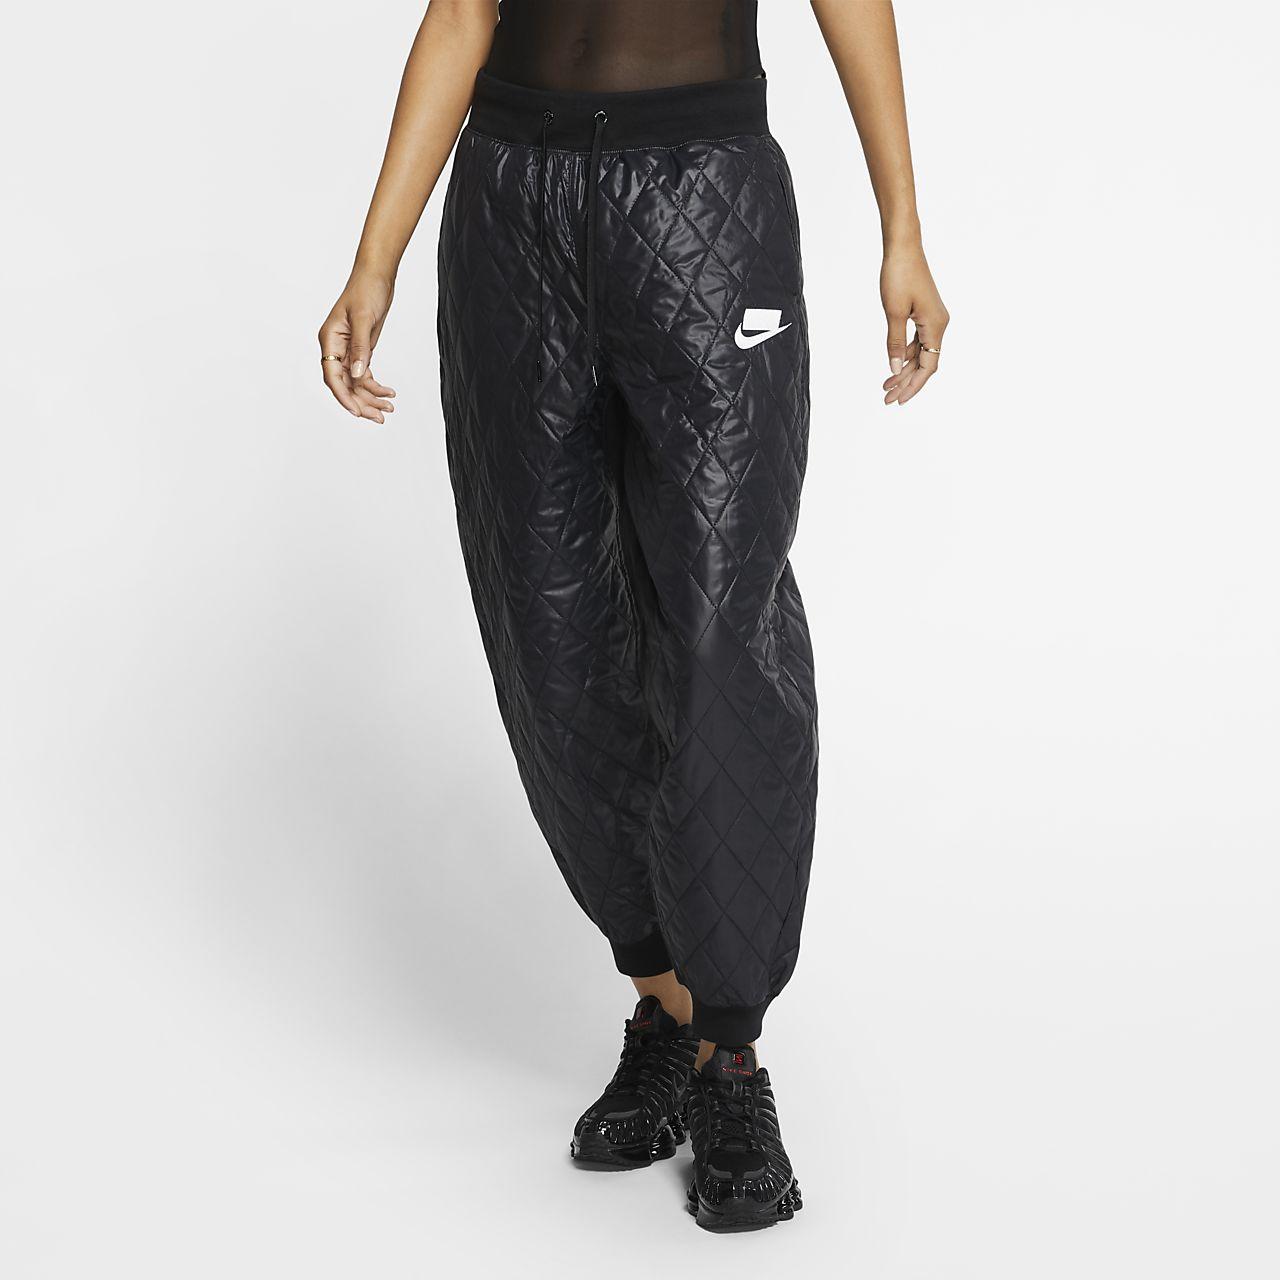 Nike Sportswear Nike Sport Pack 女子绗缝长裤